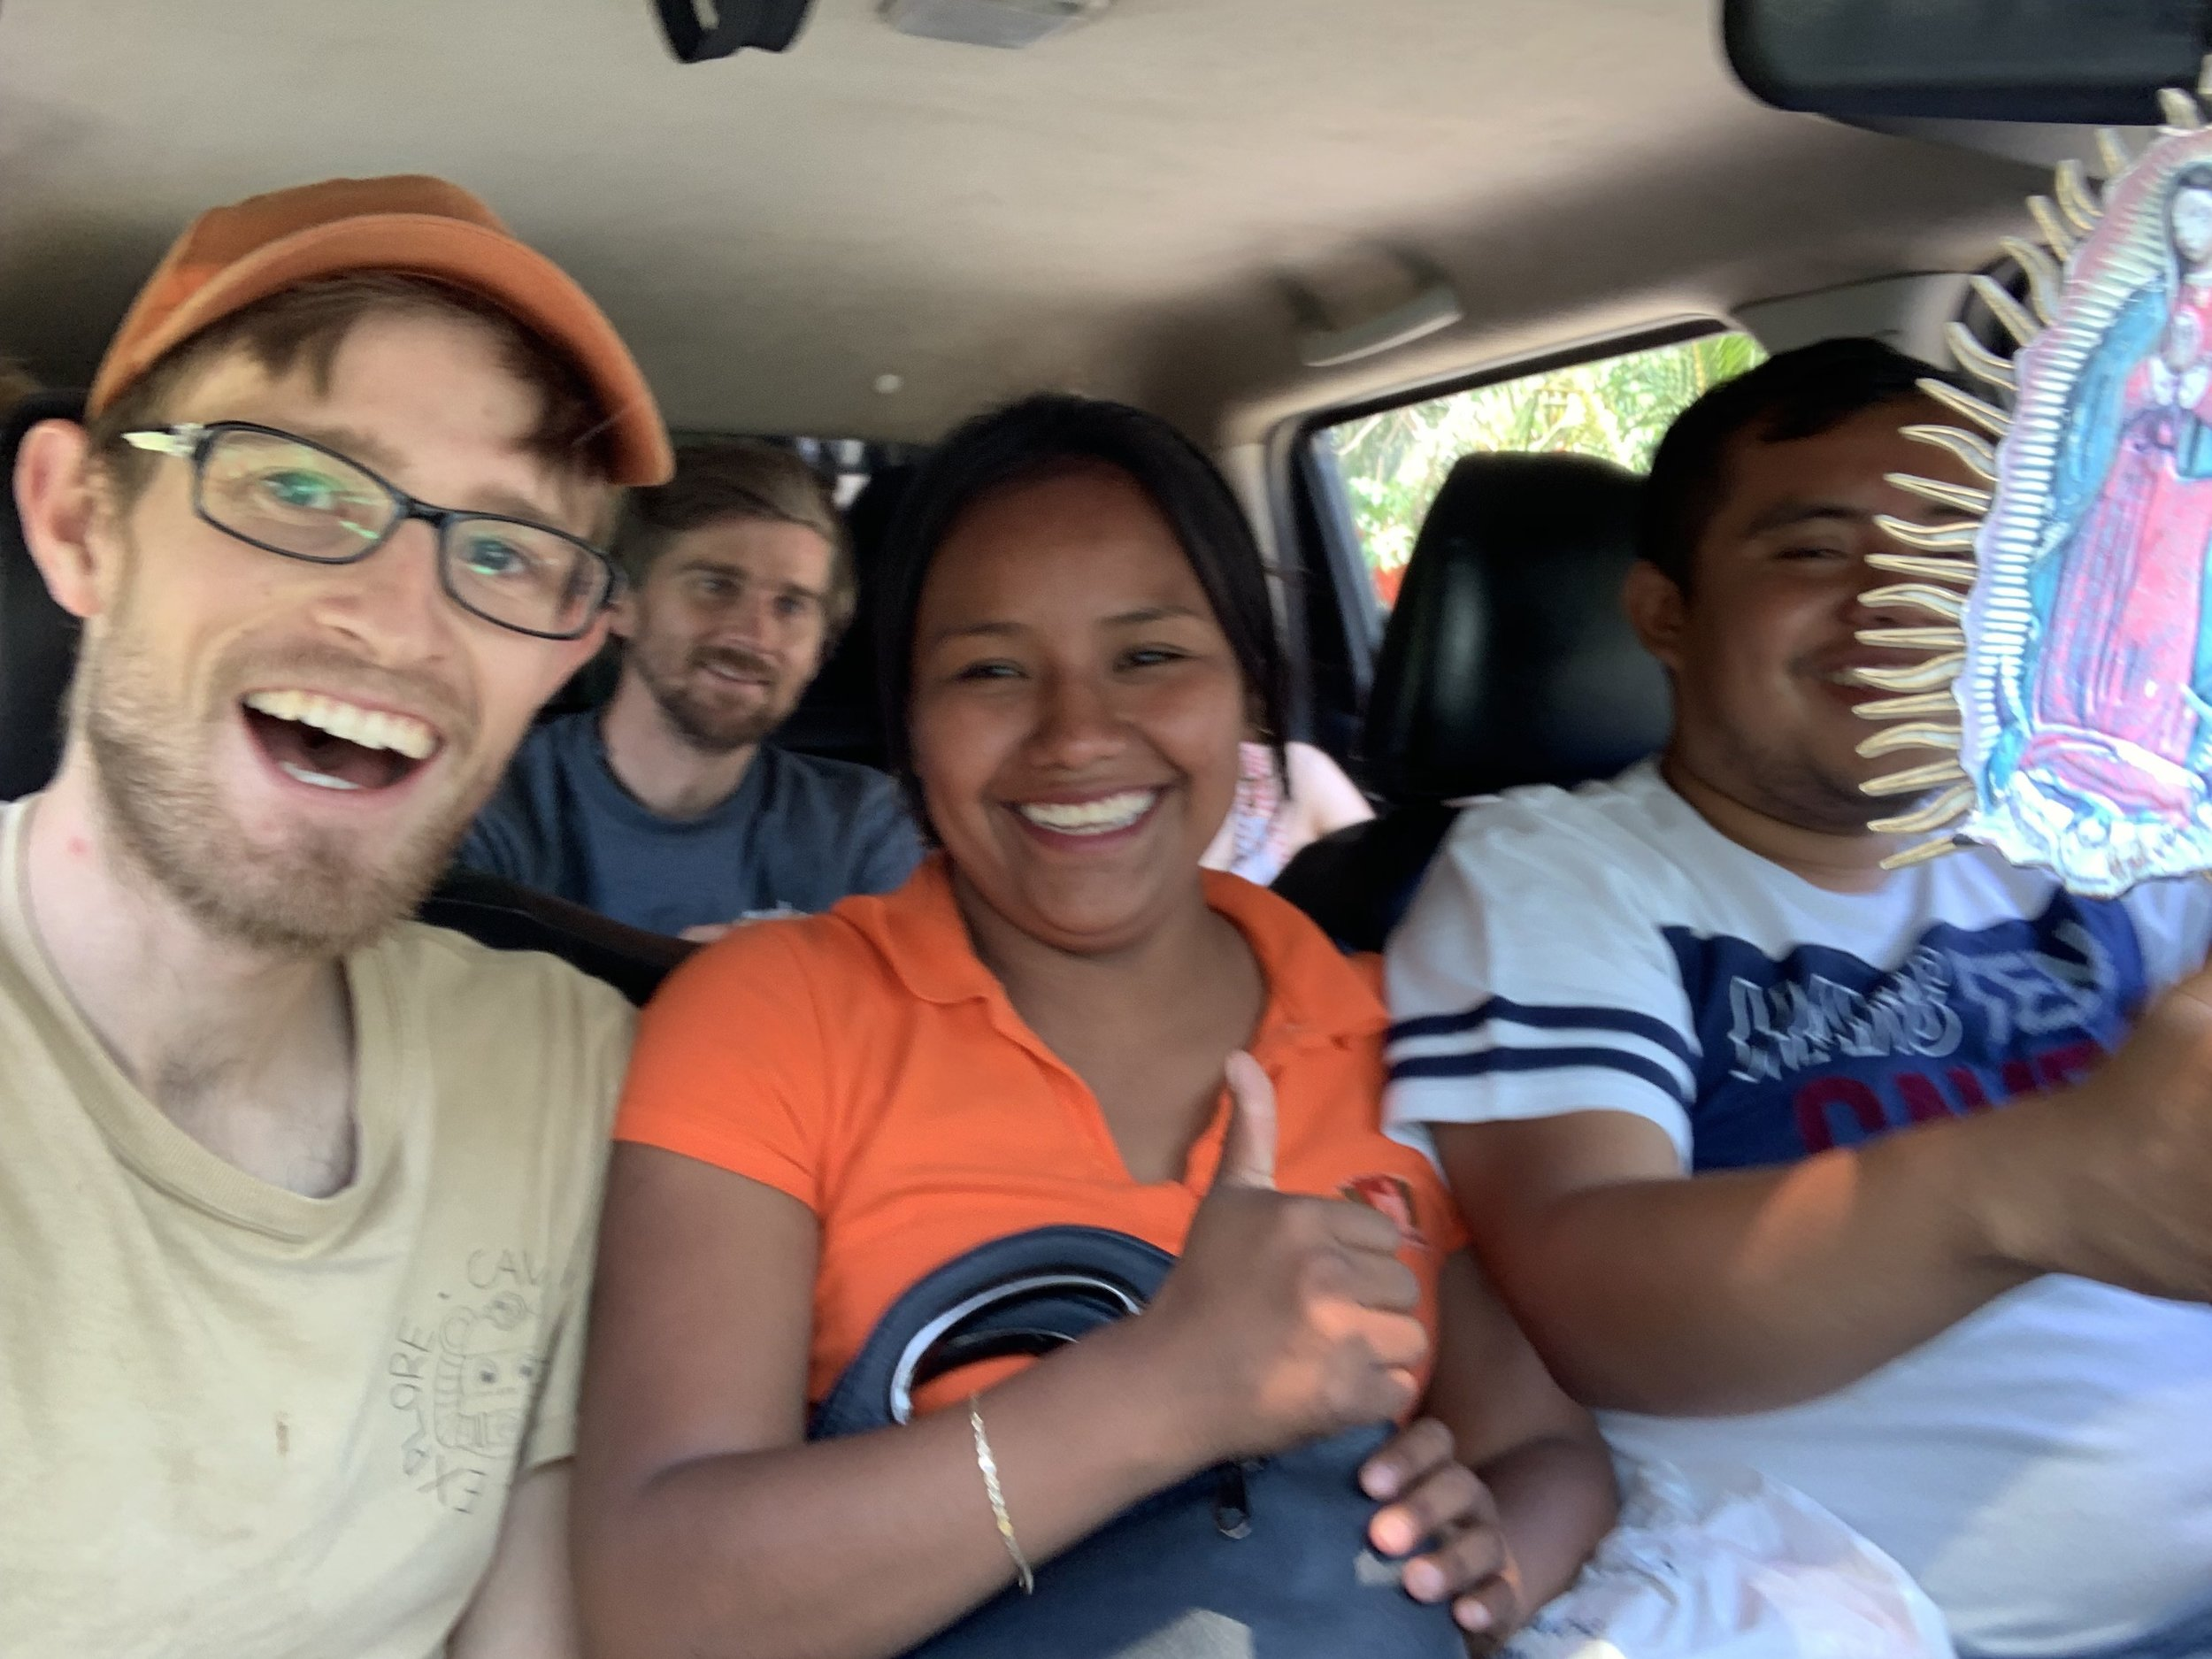 Teddy Garlock, tourism officer Tatiana López, and Jon Lillestolen in the expedition truck. Photo by Teddy Garlock.